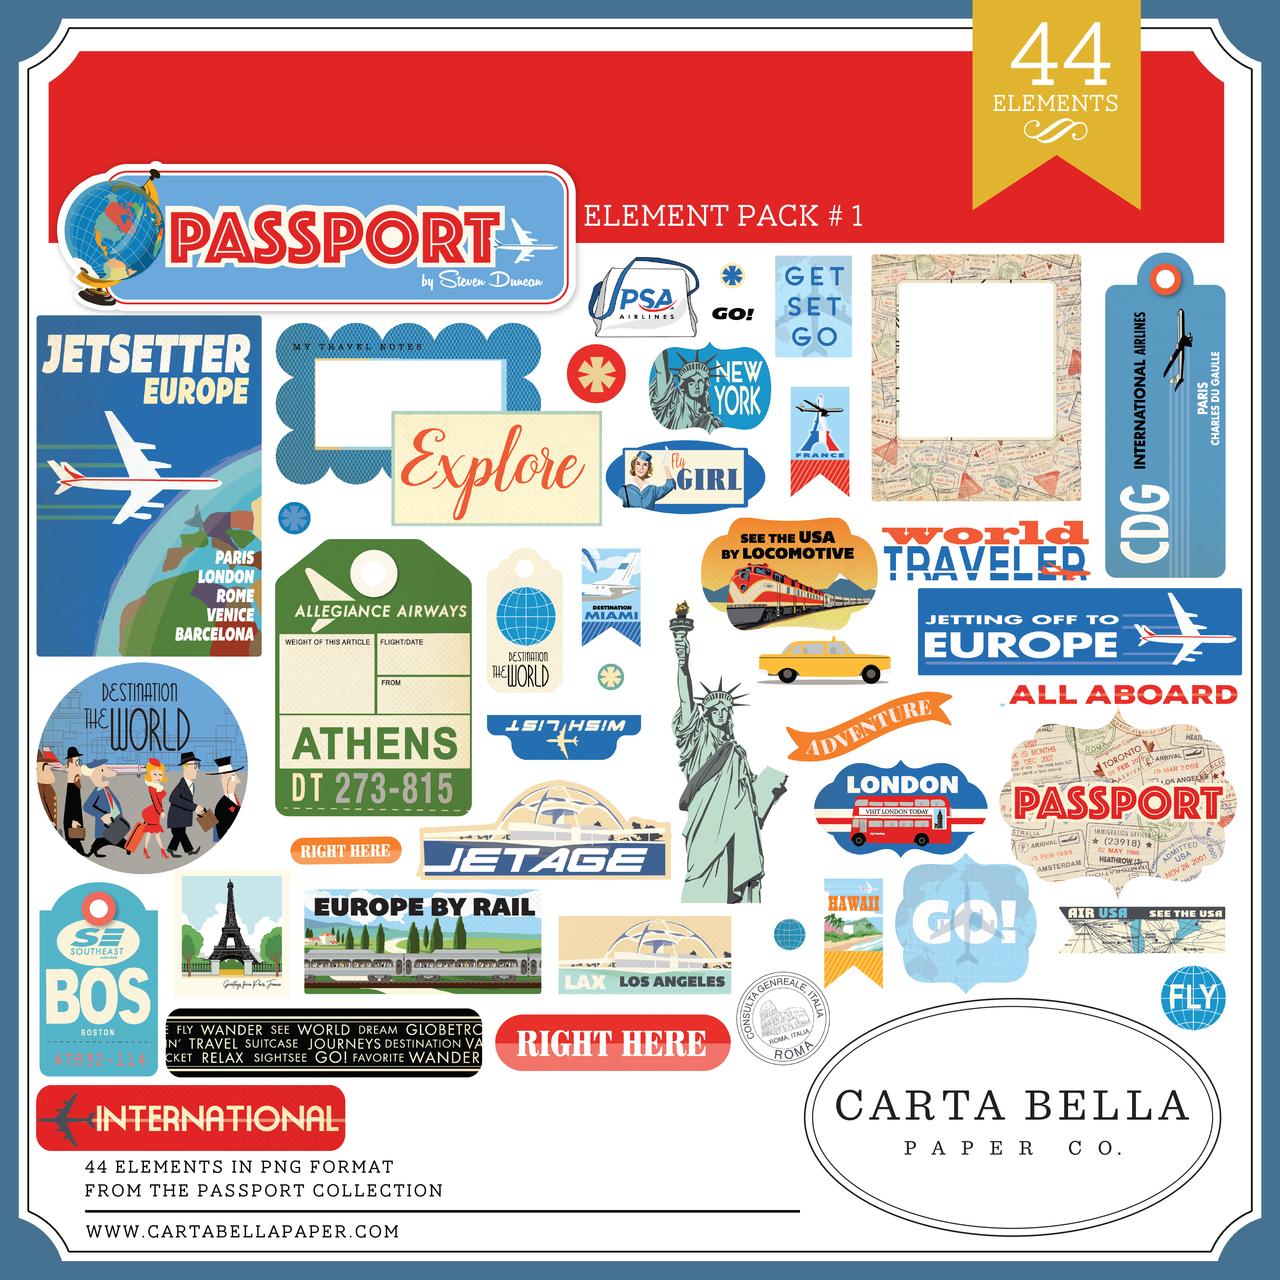 Passport Element Pack #1